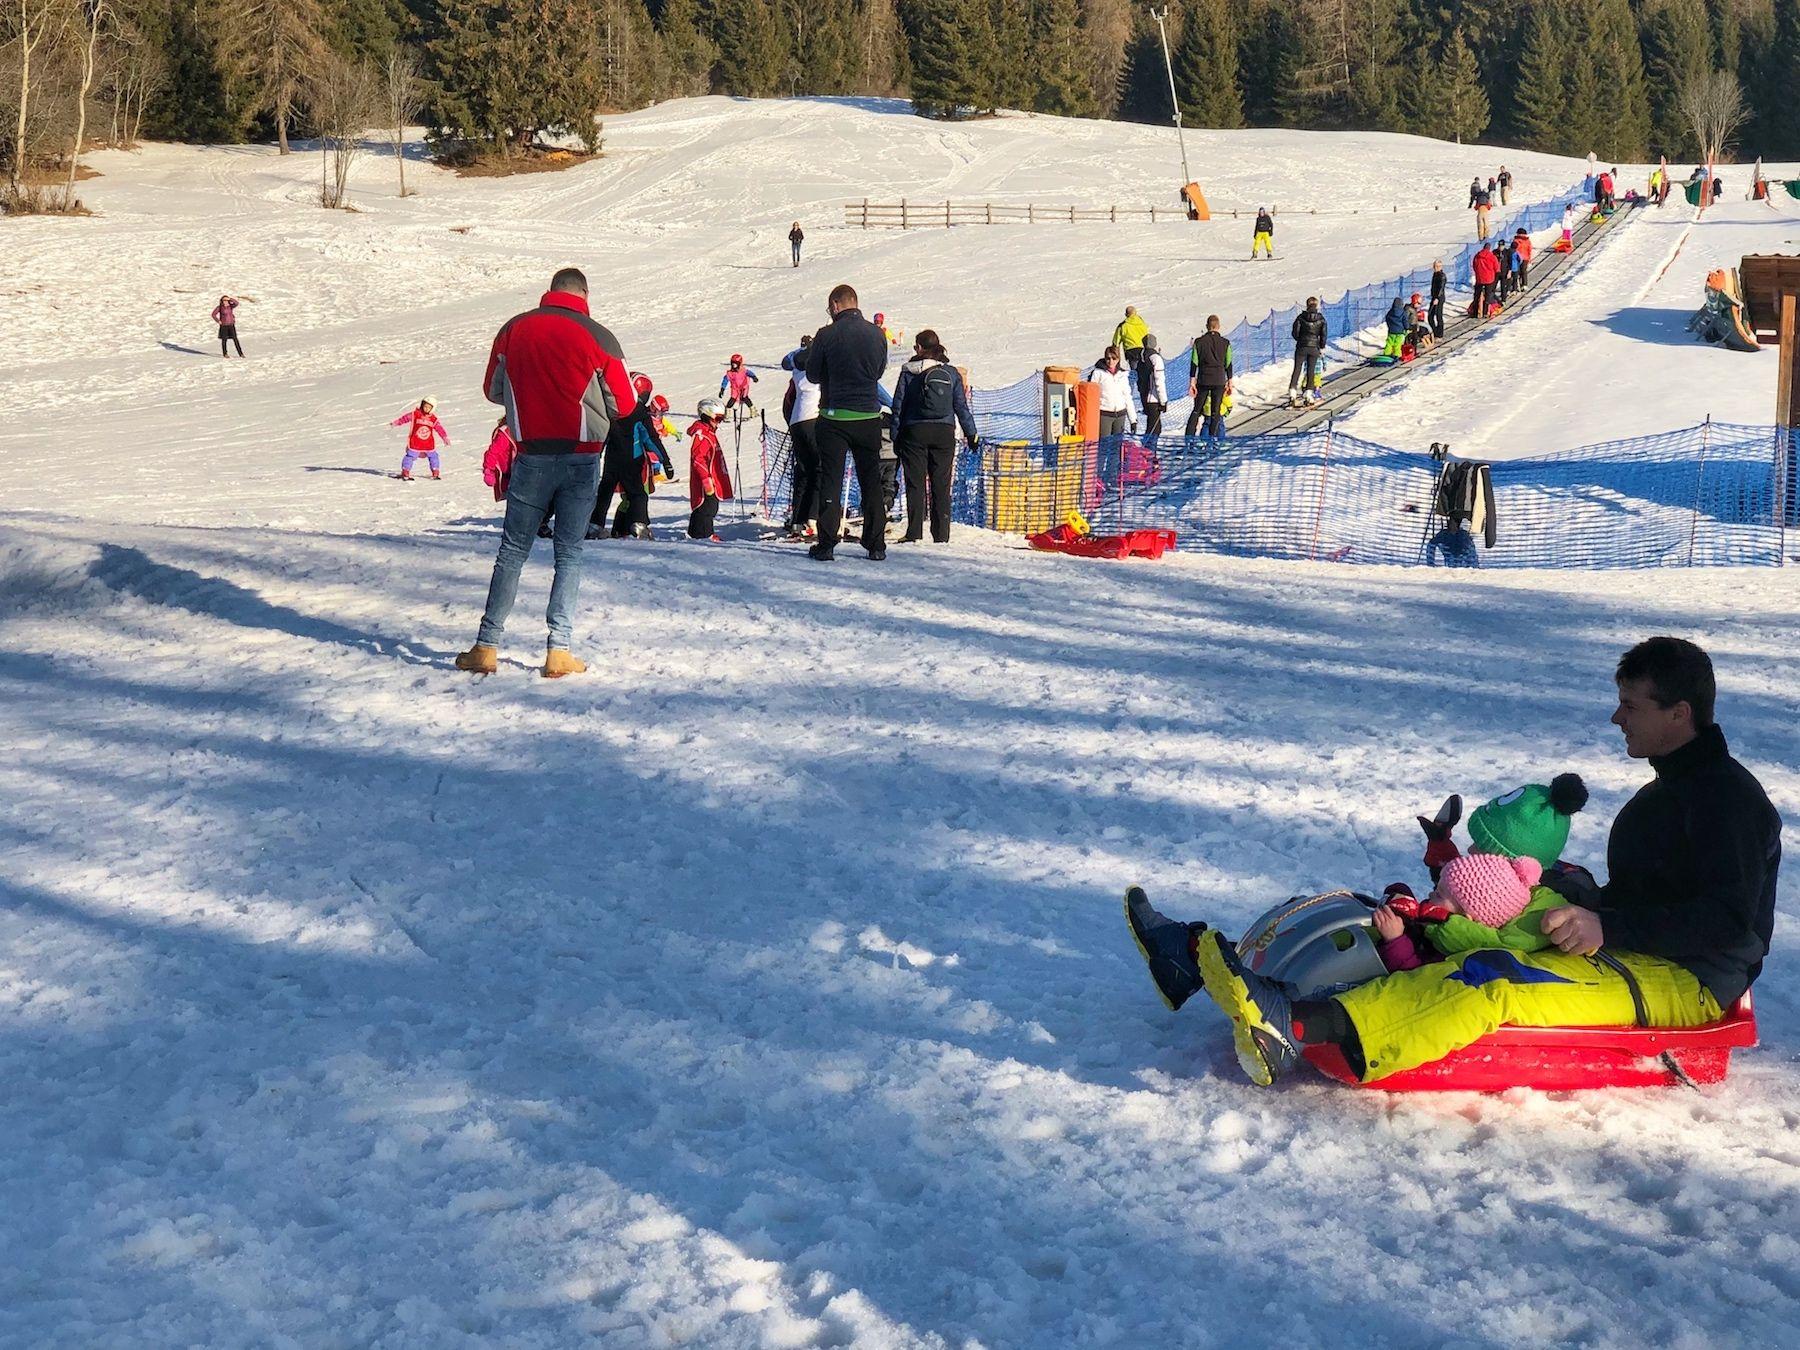 predaia-passo predaia inverno-snow park